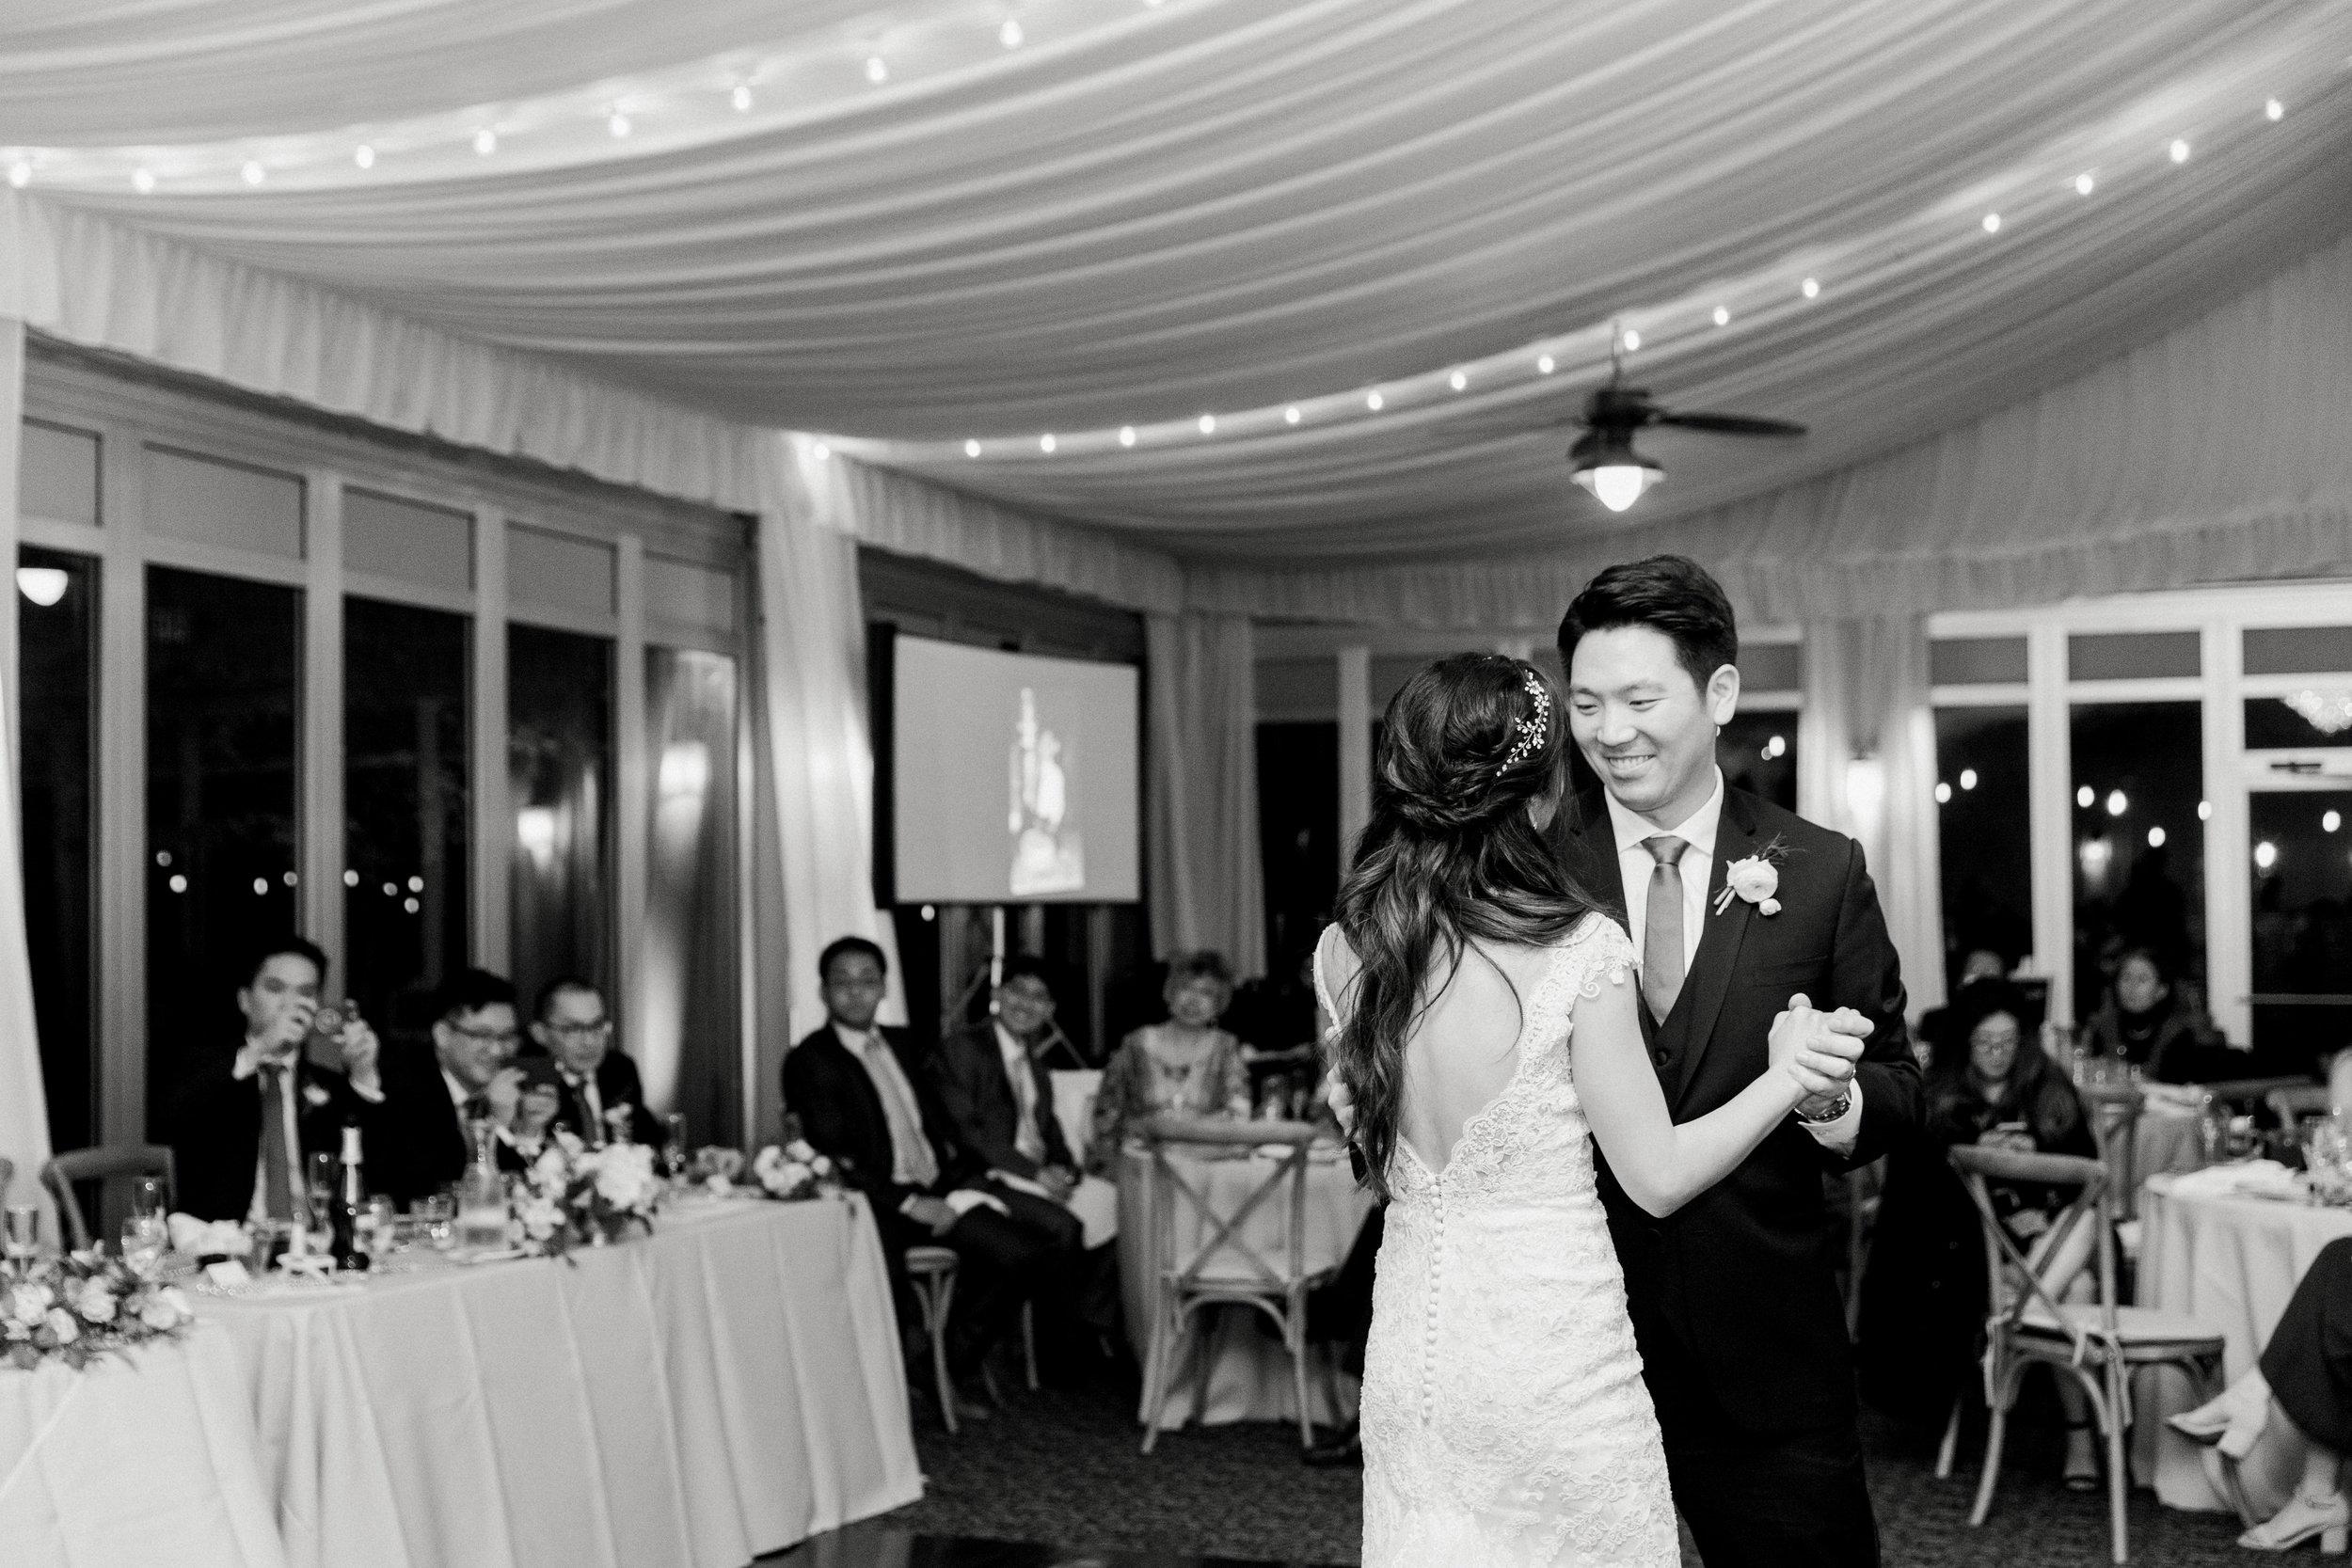 JA_Wedding_Reception_265.jpg